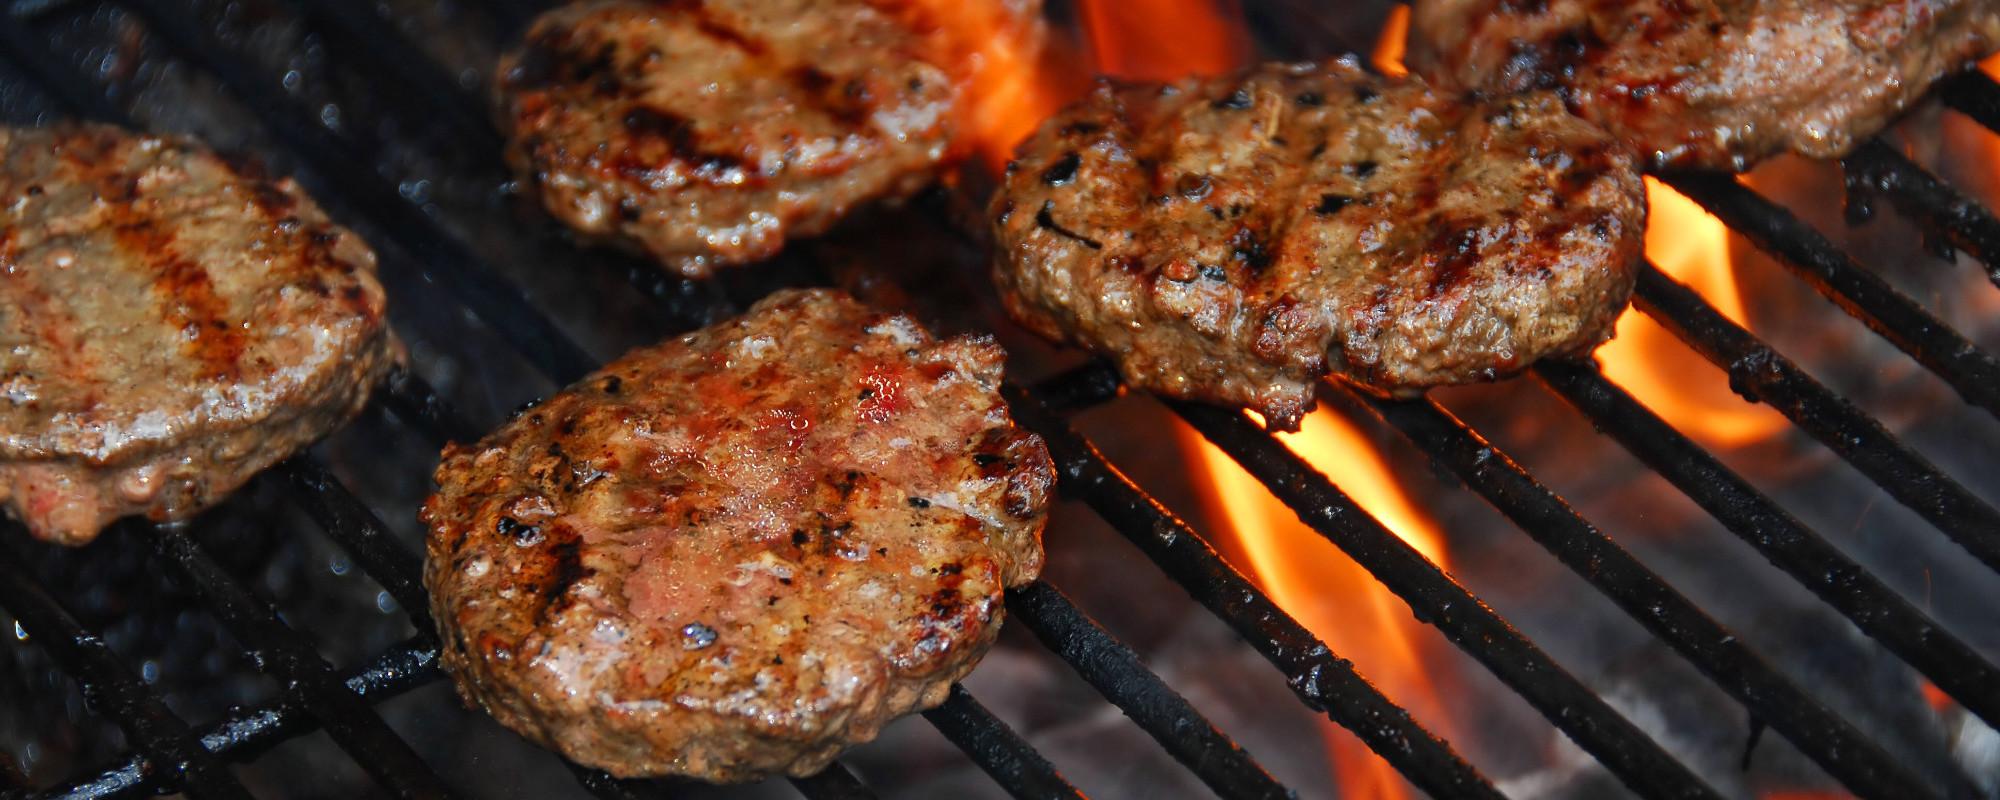 Ungers Market - Meat Department Header